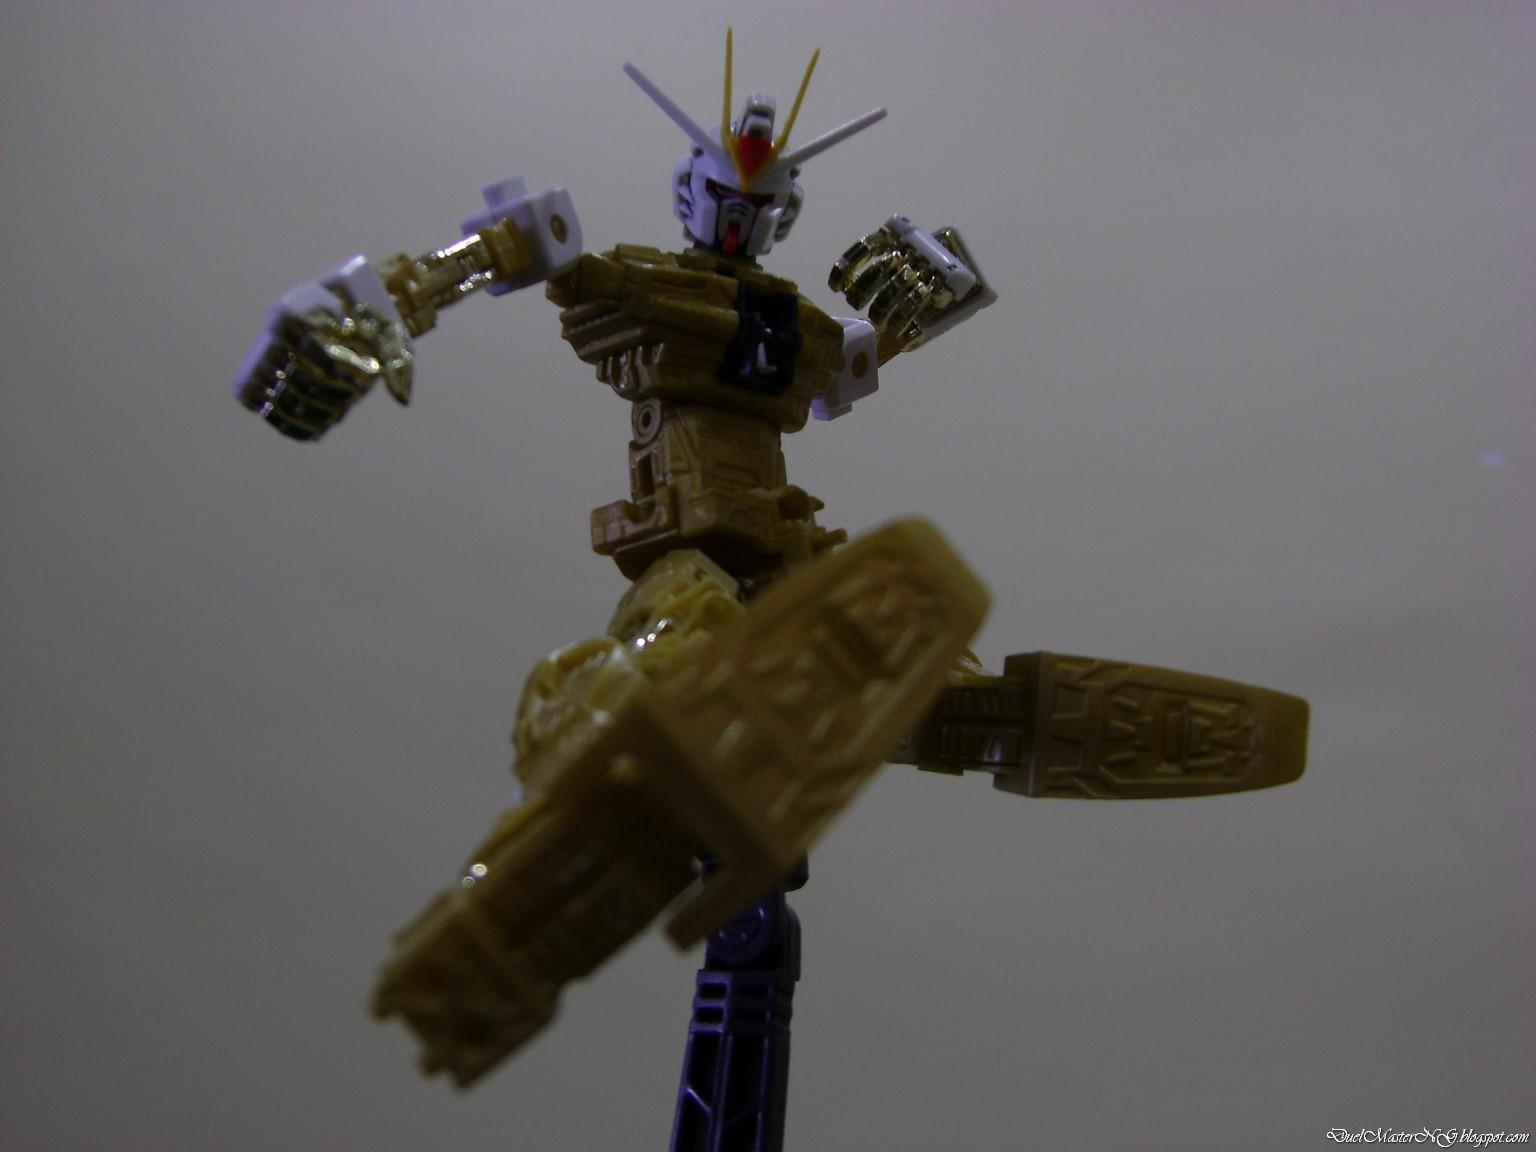 DuelMasterNG Gunpla: MG Strike Freedom Full Burst Mode (Gao Gao)